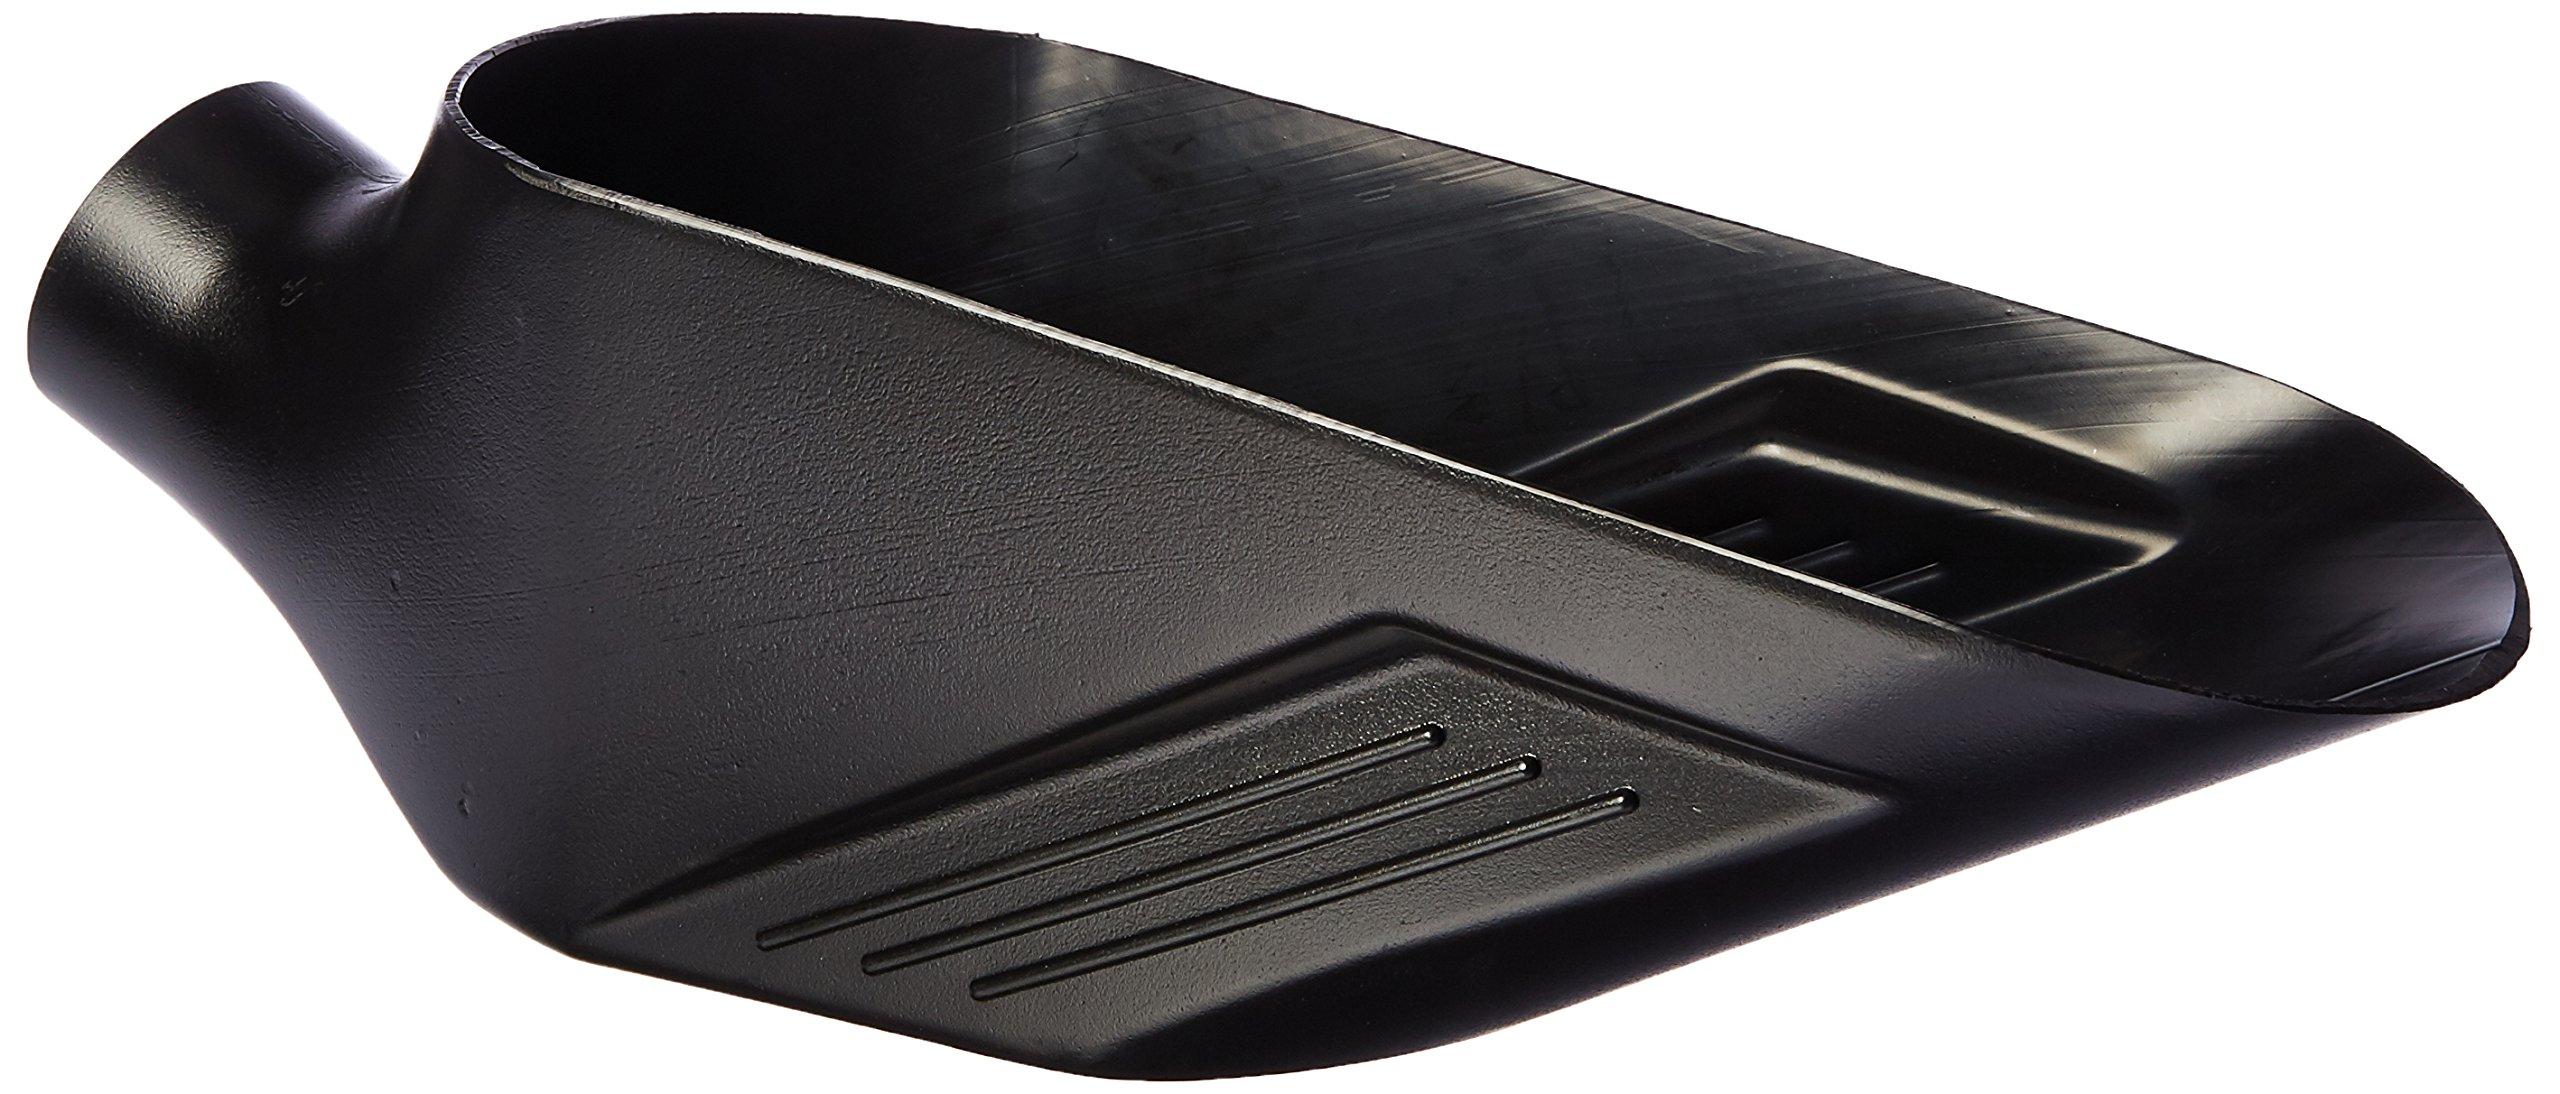 Rattleware Bean Scale Coffee Scoop, Black by Rattleware (Image #1)